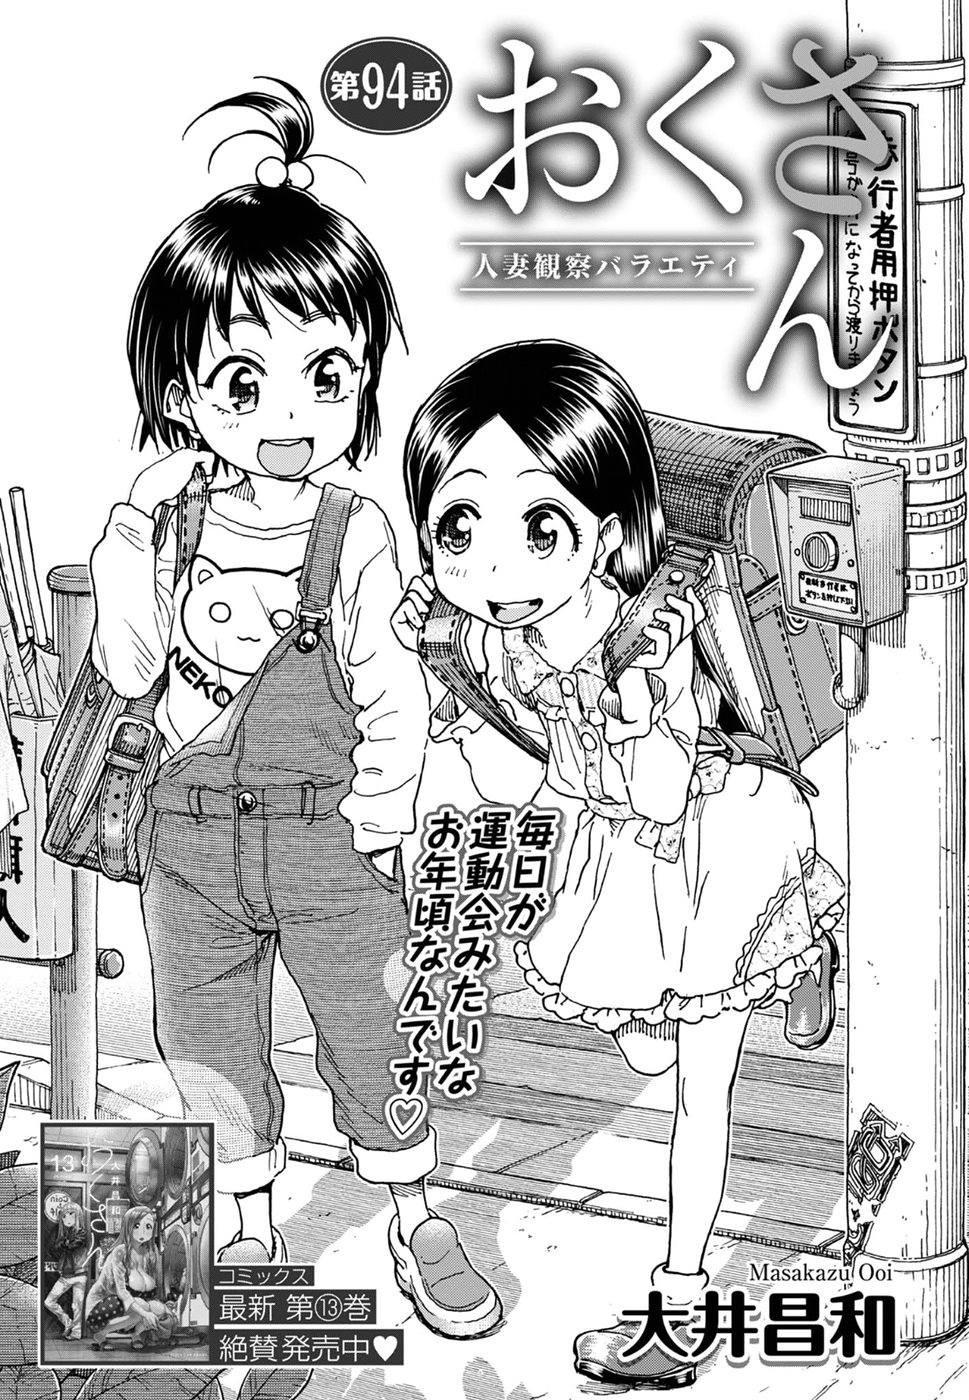 Okusan - Chapter 94 - Page 1